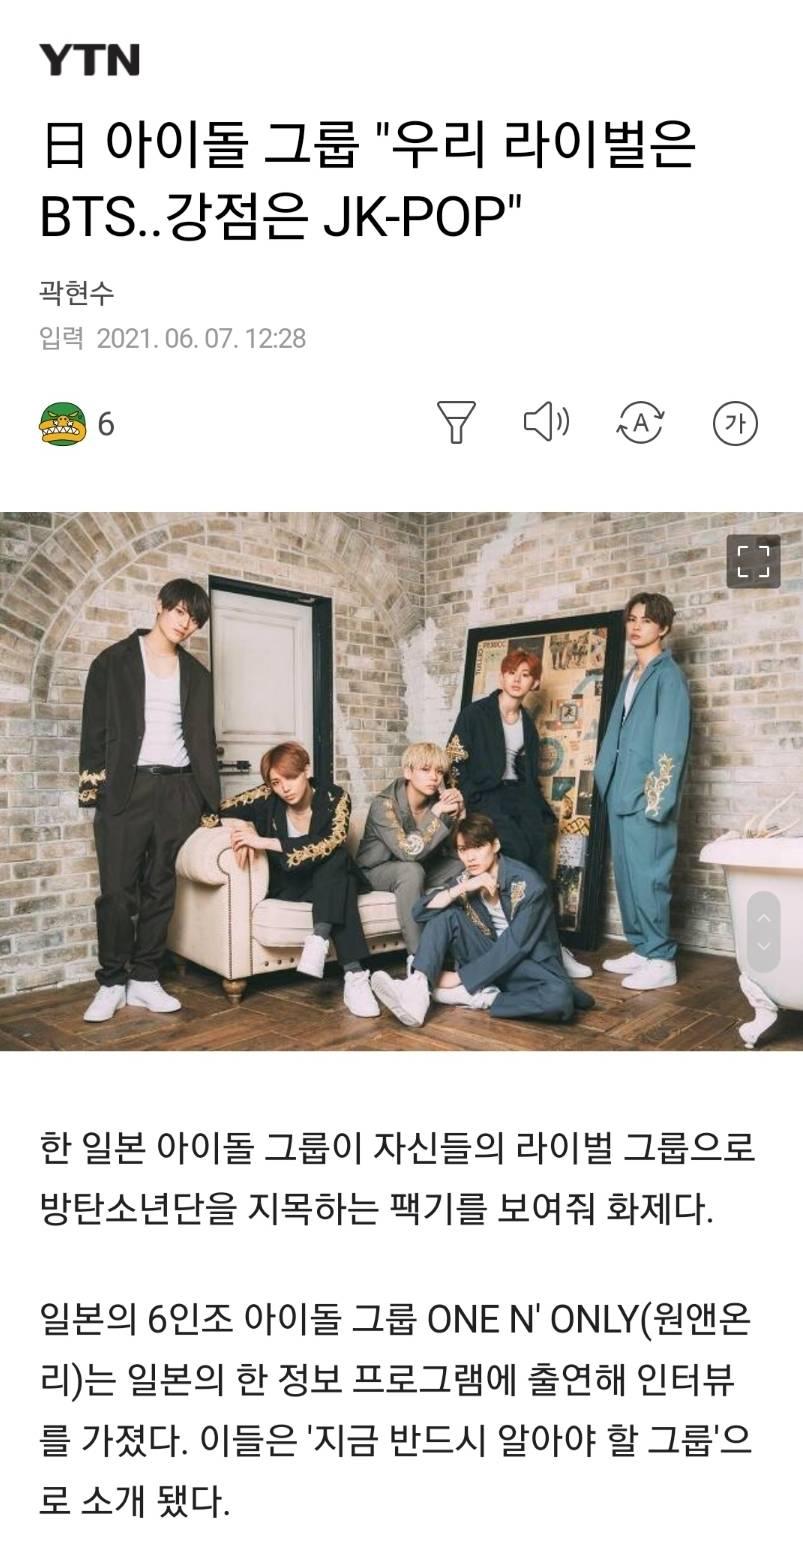 JK-POP이 강점인 BTS의 라이벌.jpg | 인스티즈